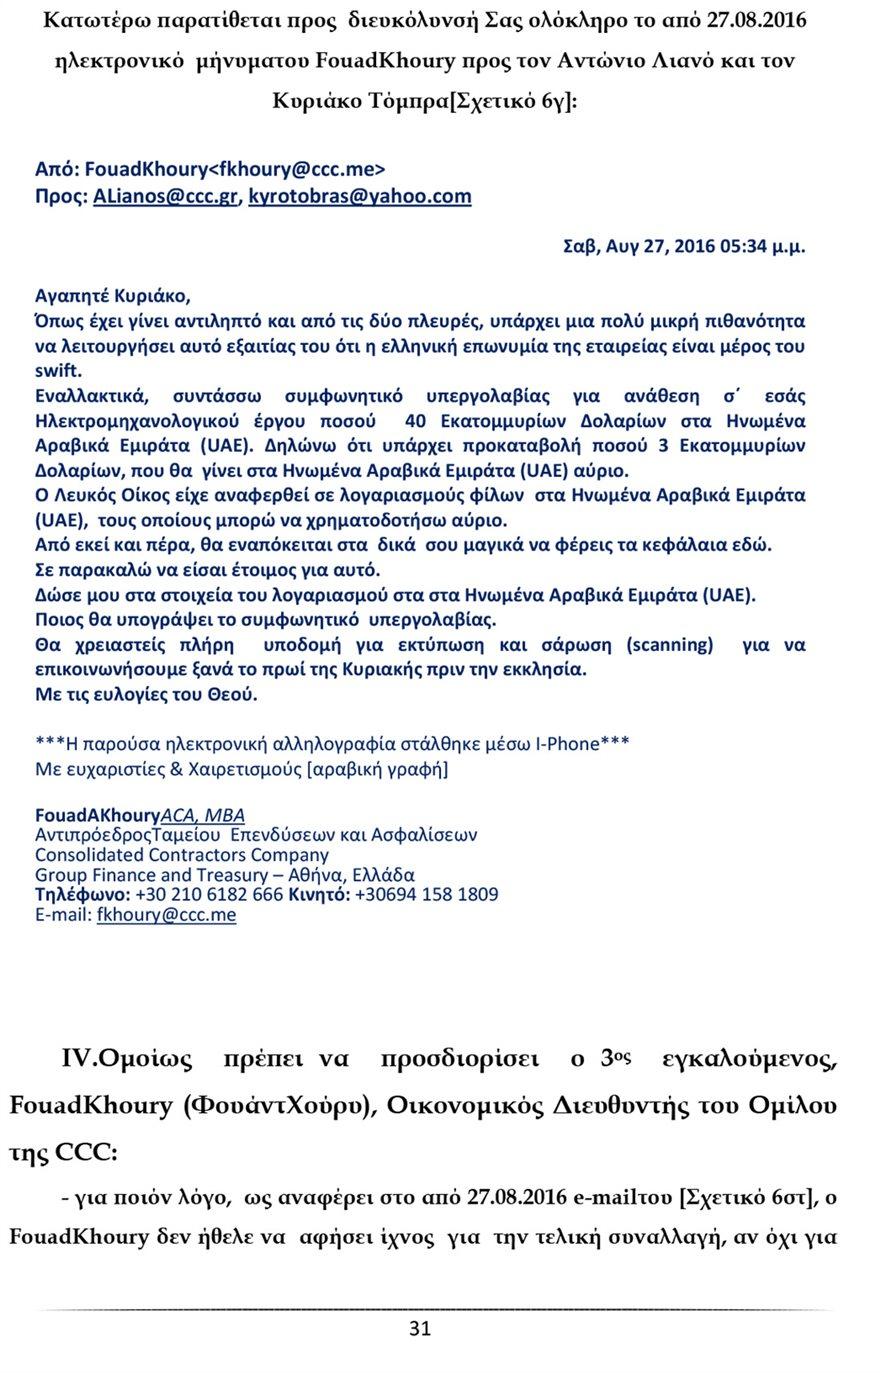 ypomnima-31